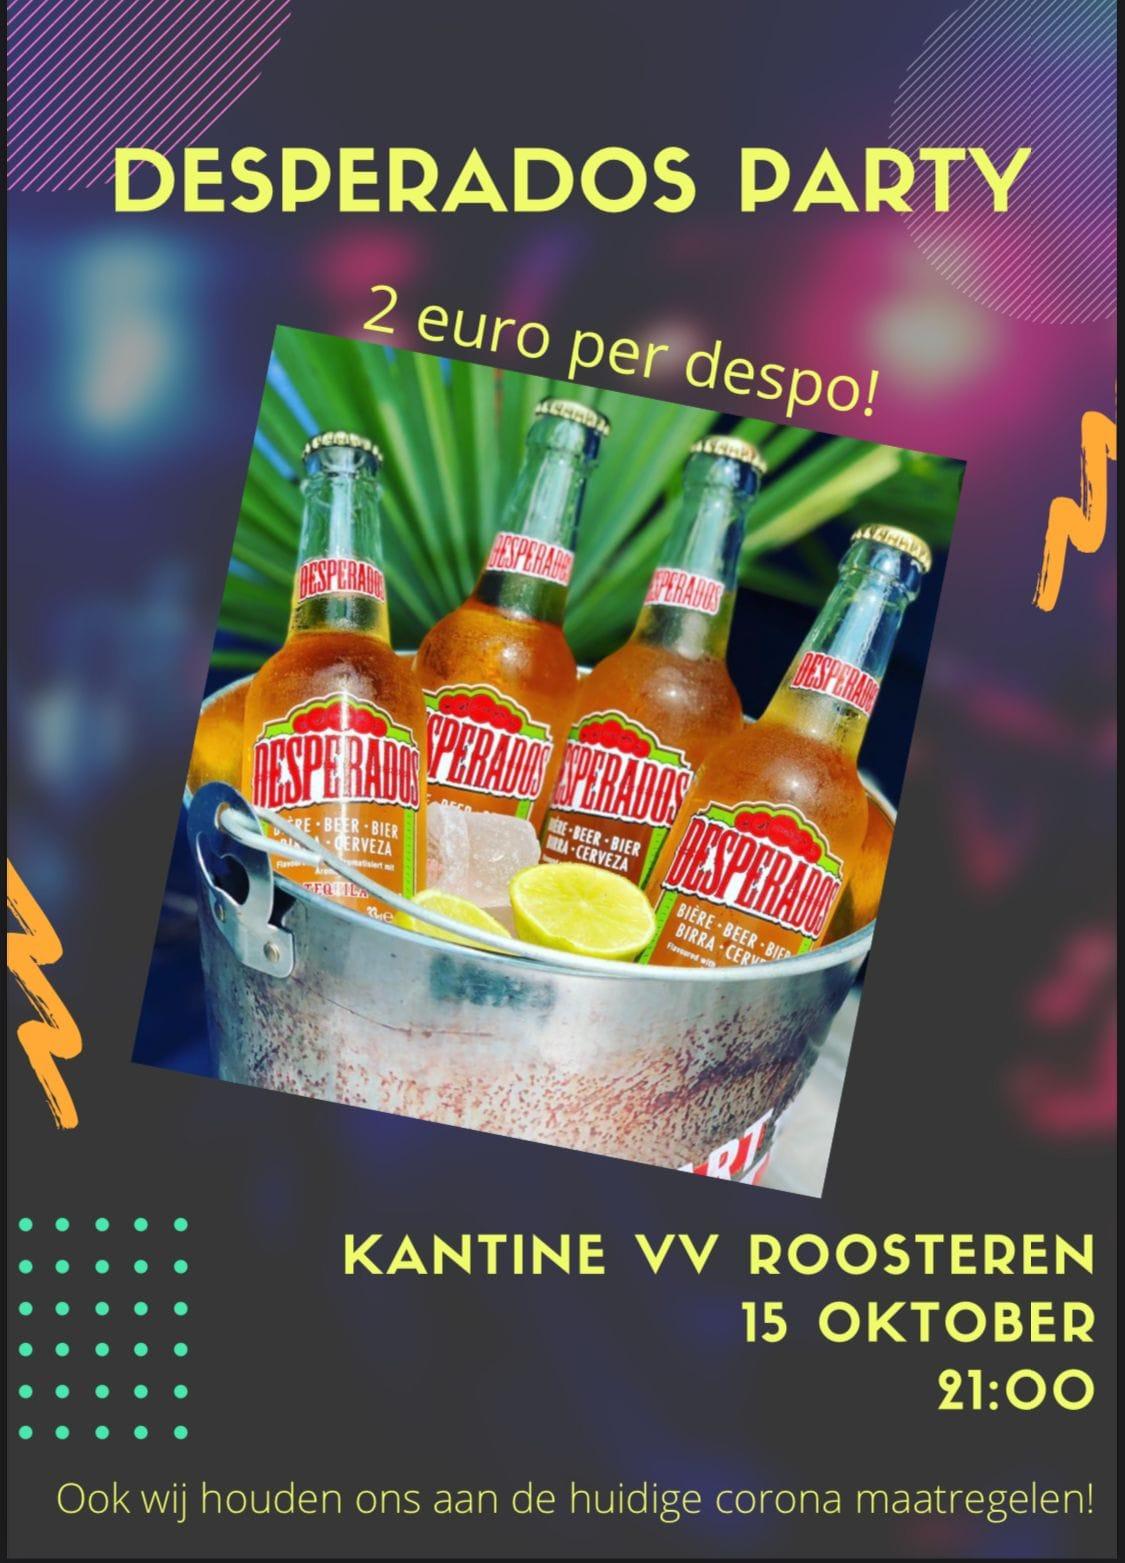 Despo Party VVR